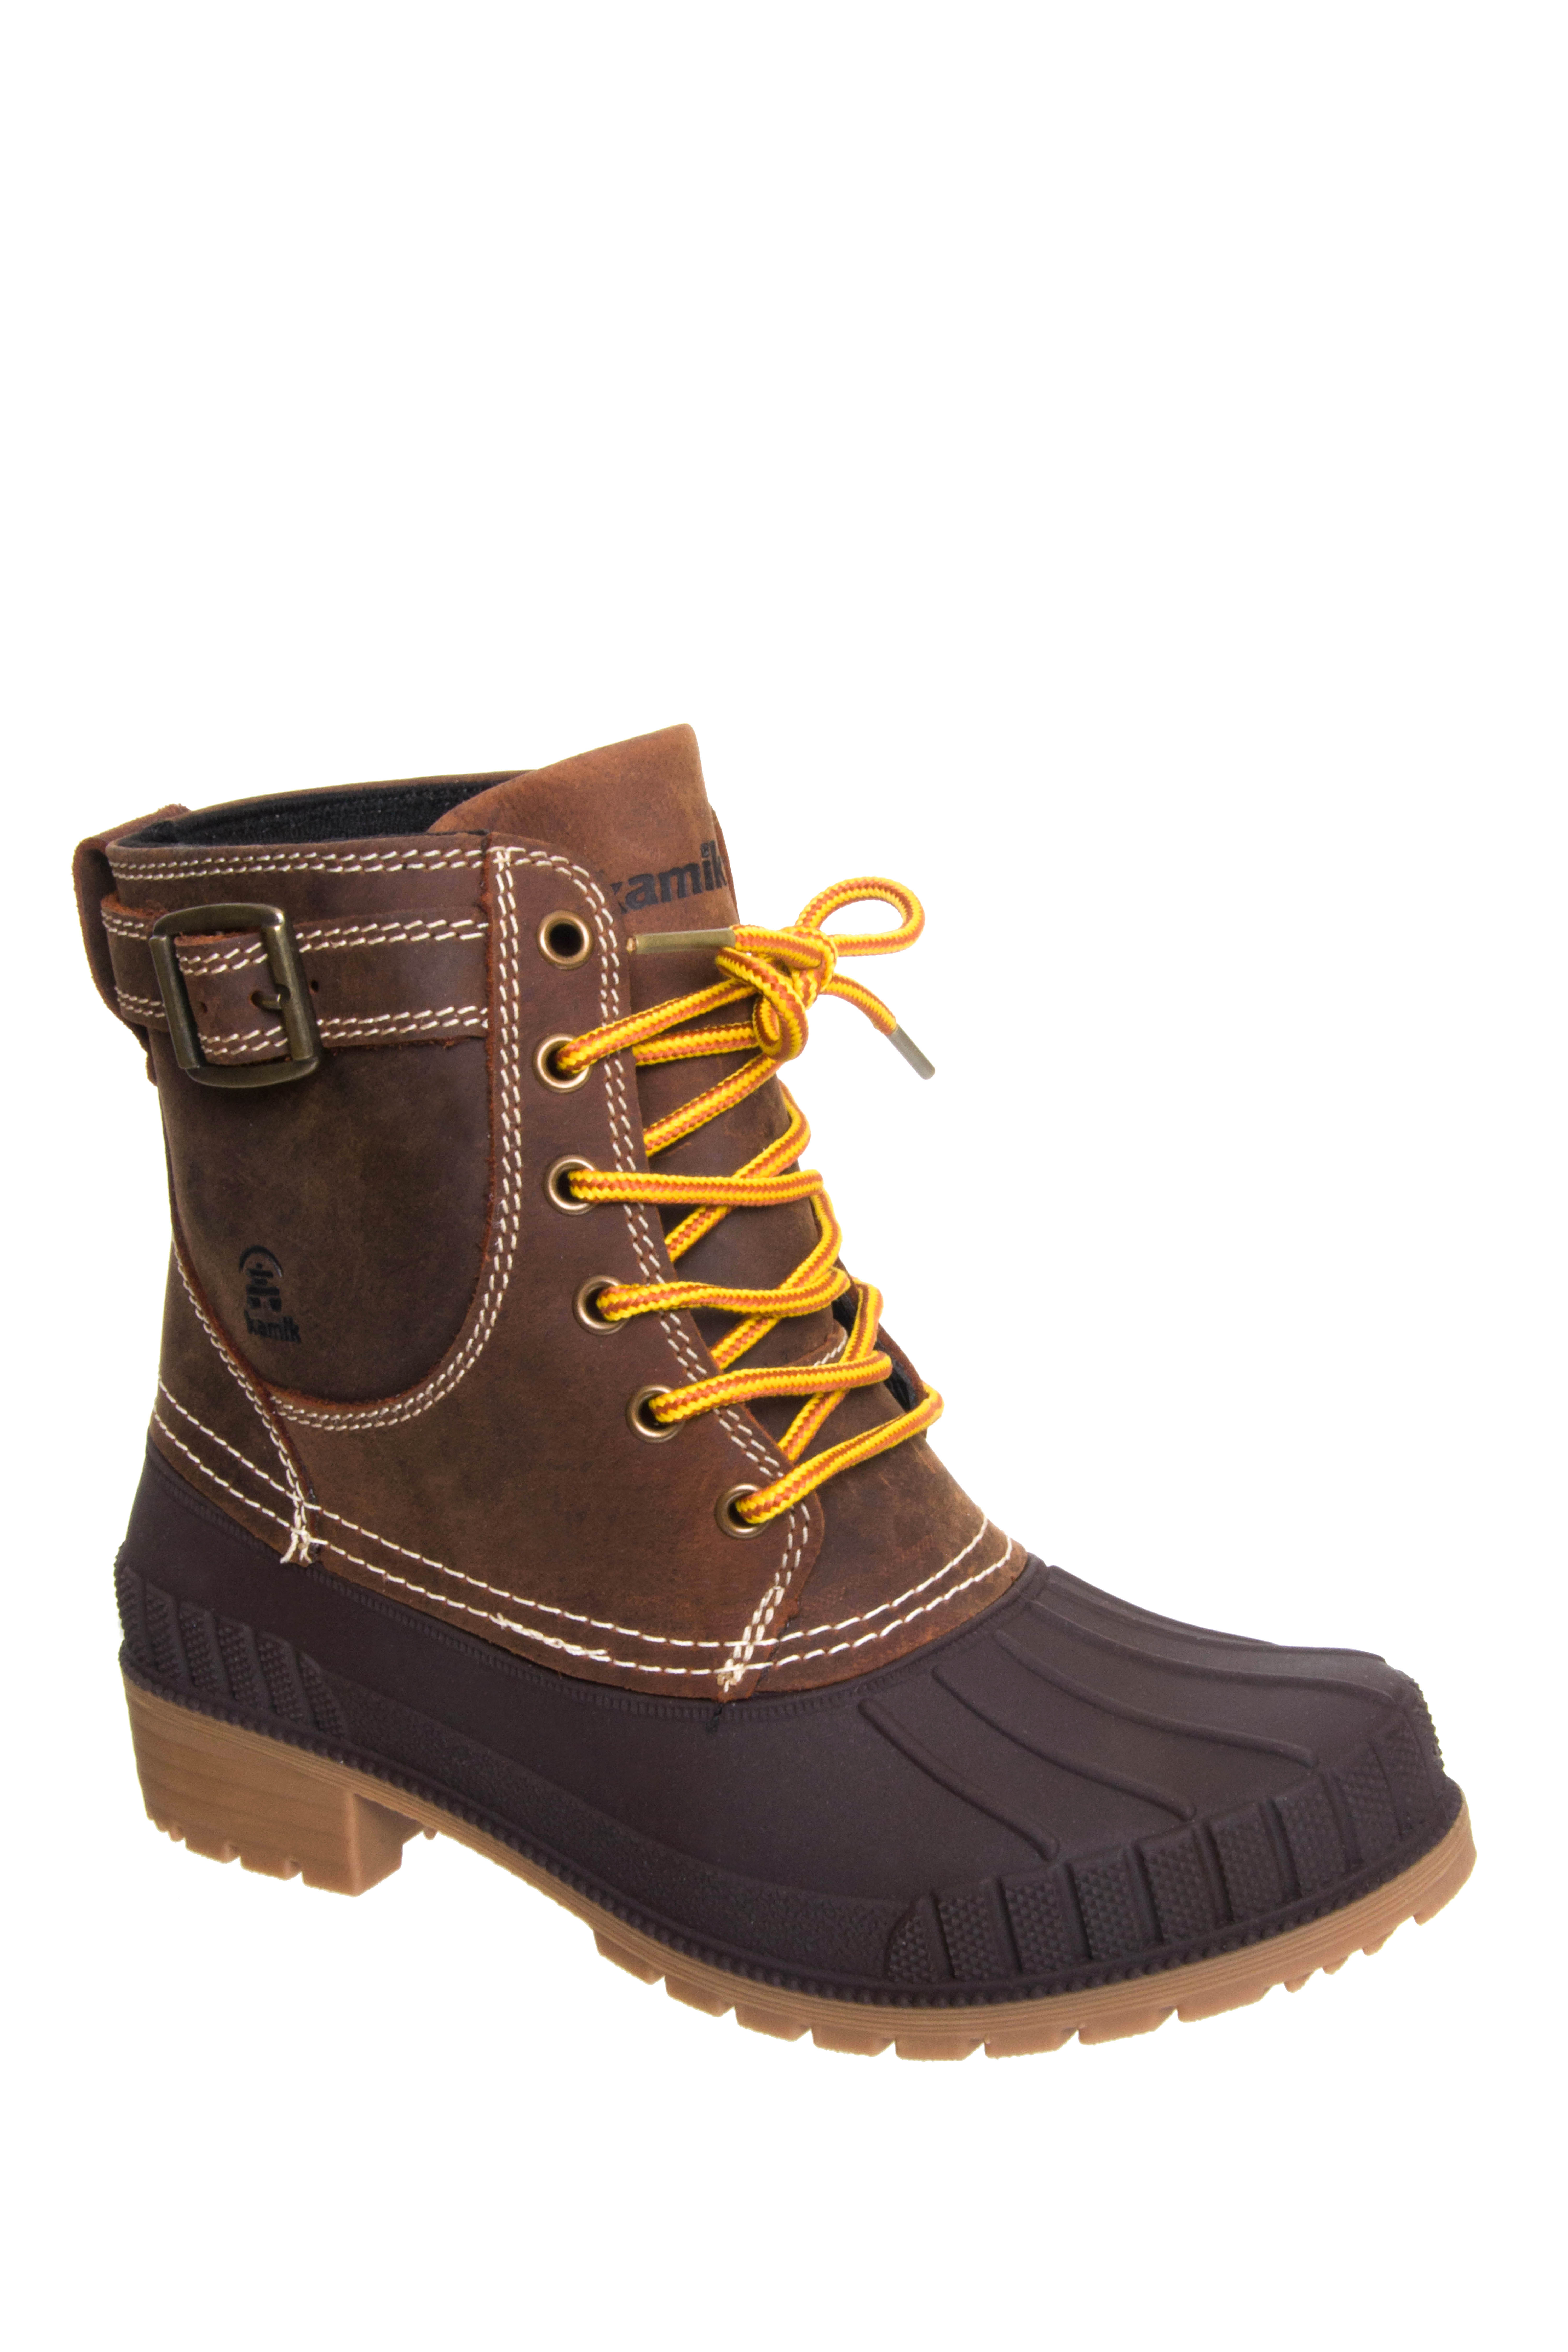 Kamik Evelyn Low Heel Snow Boots - Dark Brown